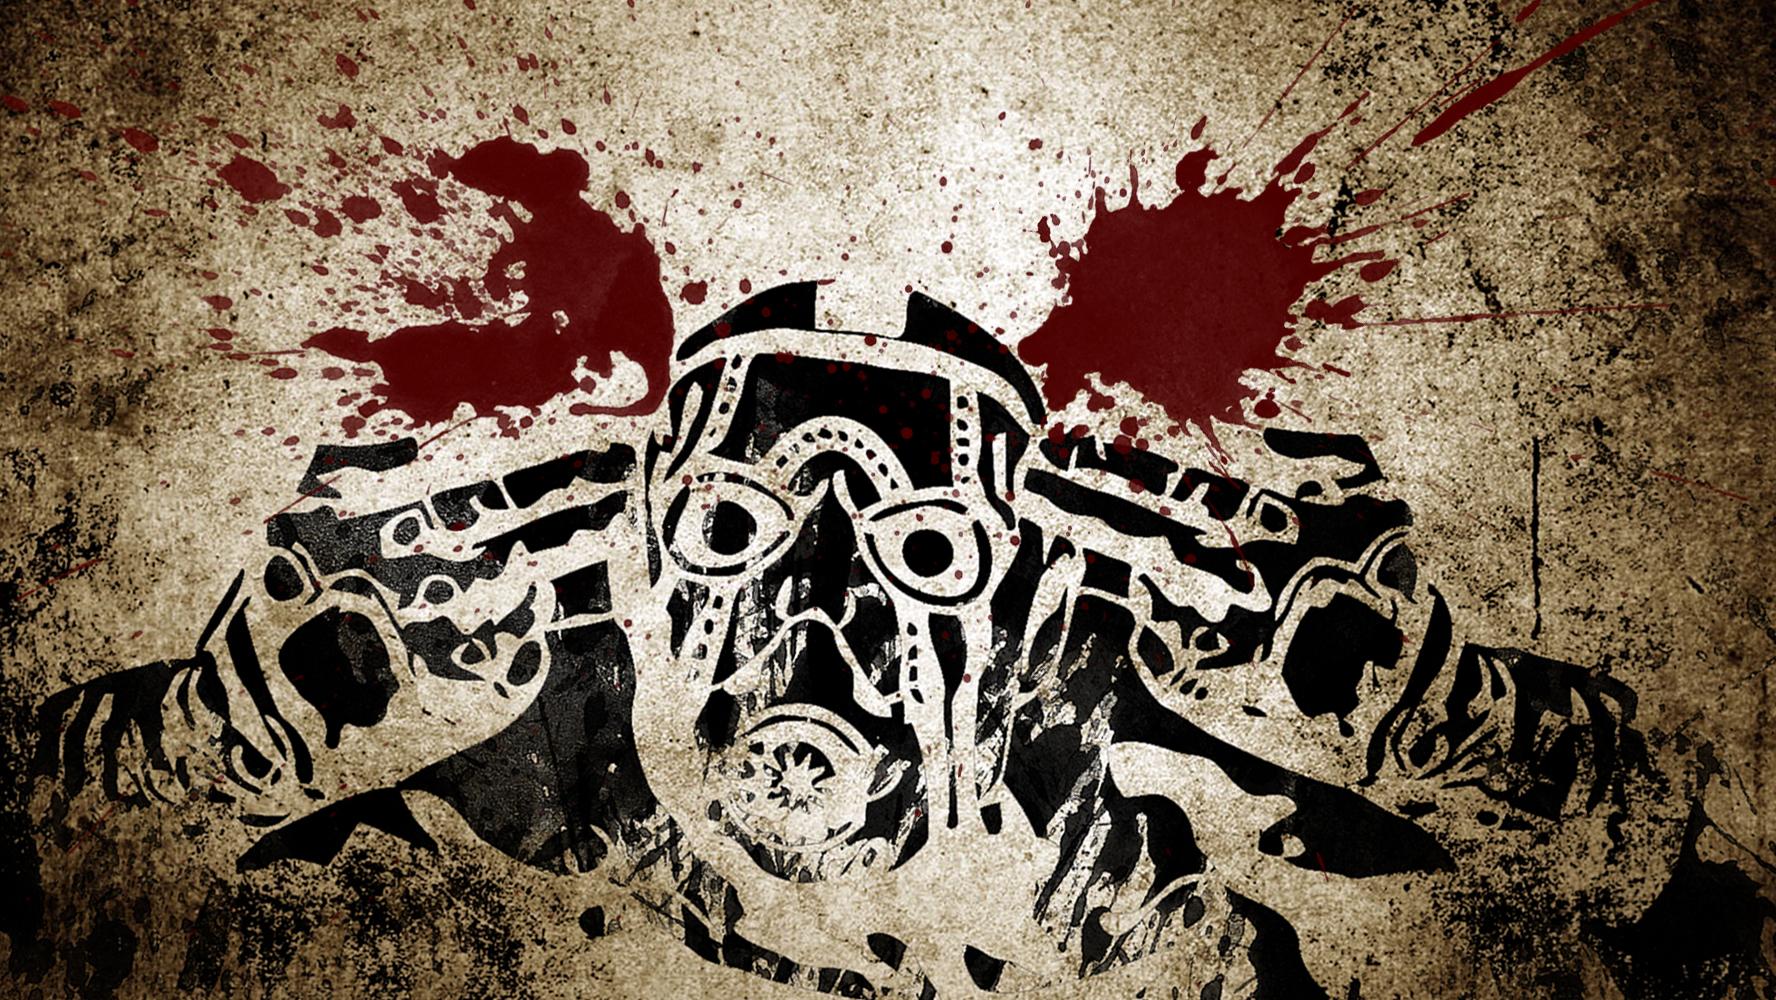 Borderlands Psycho Splats by Plopomon on DeviantArt